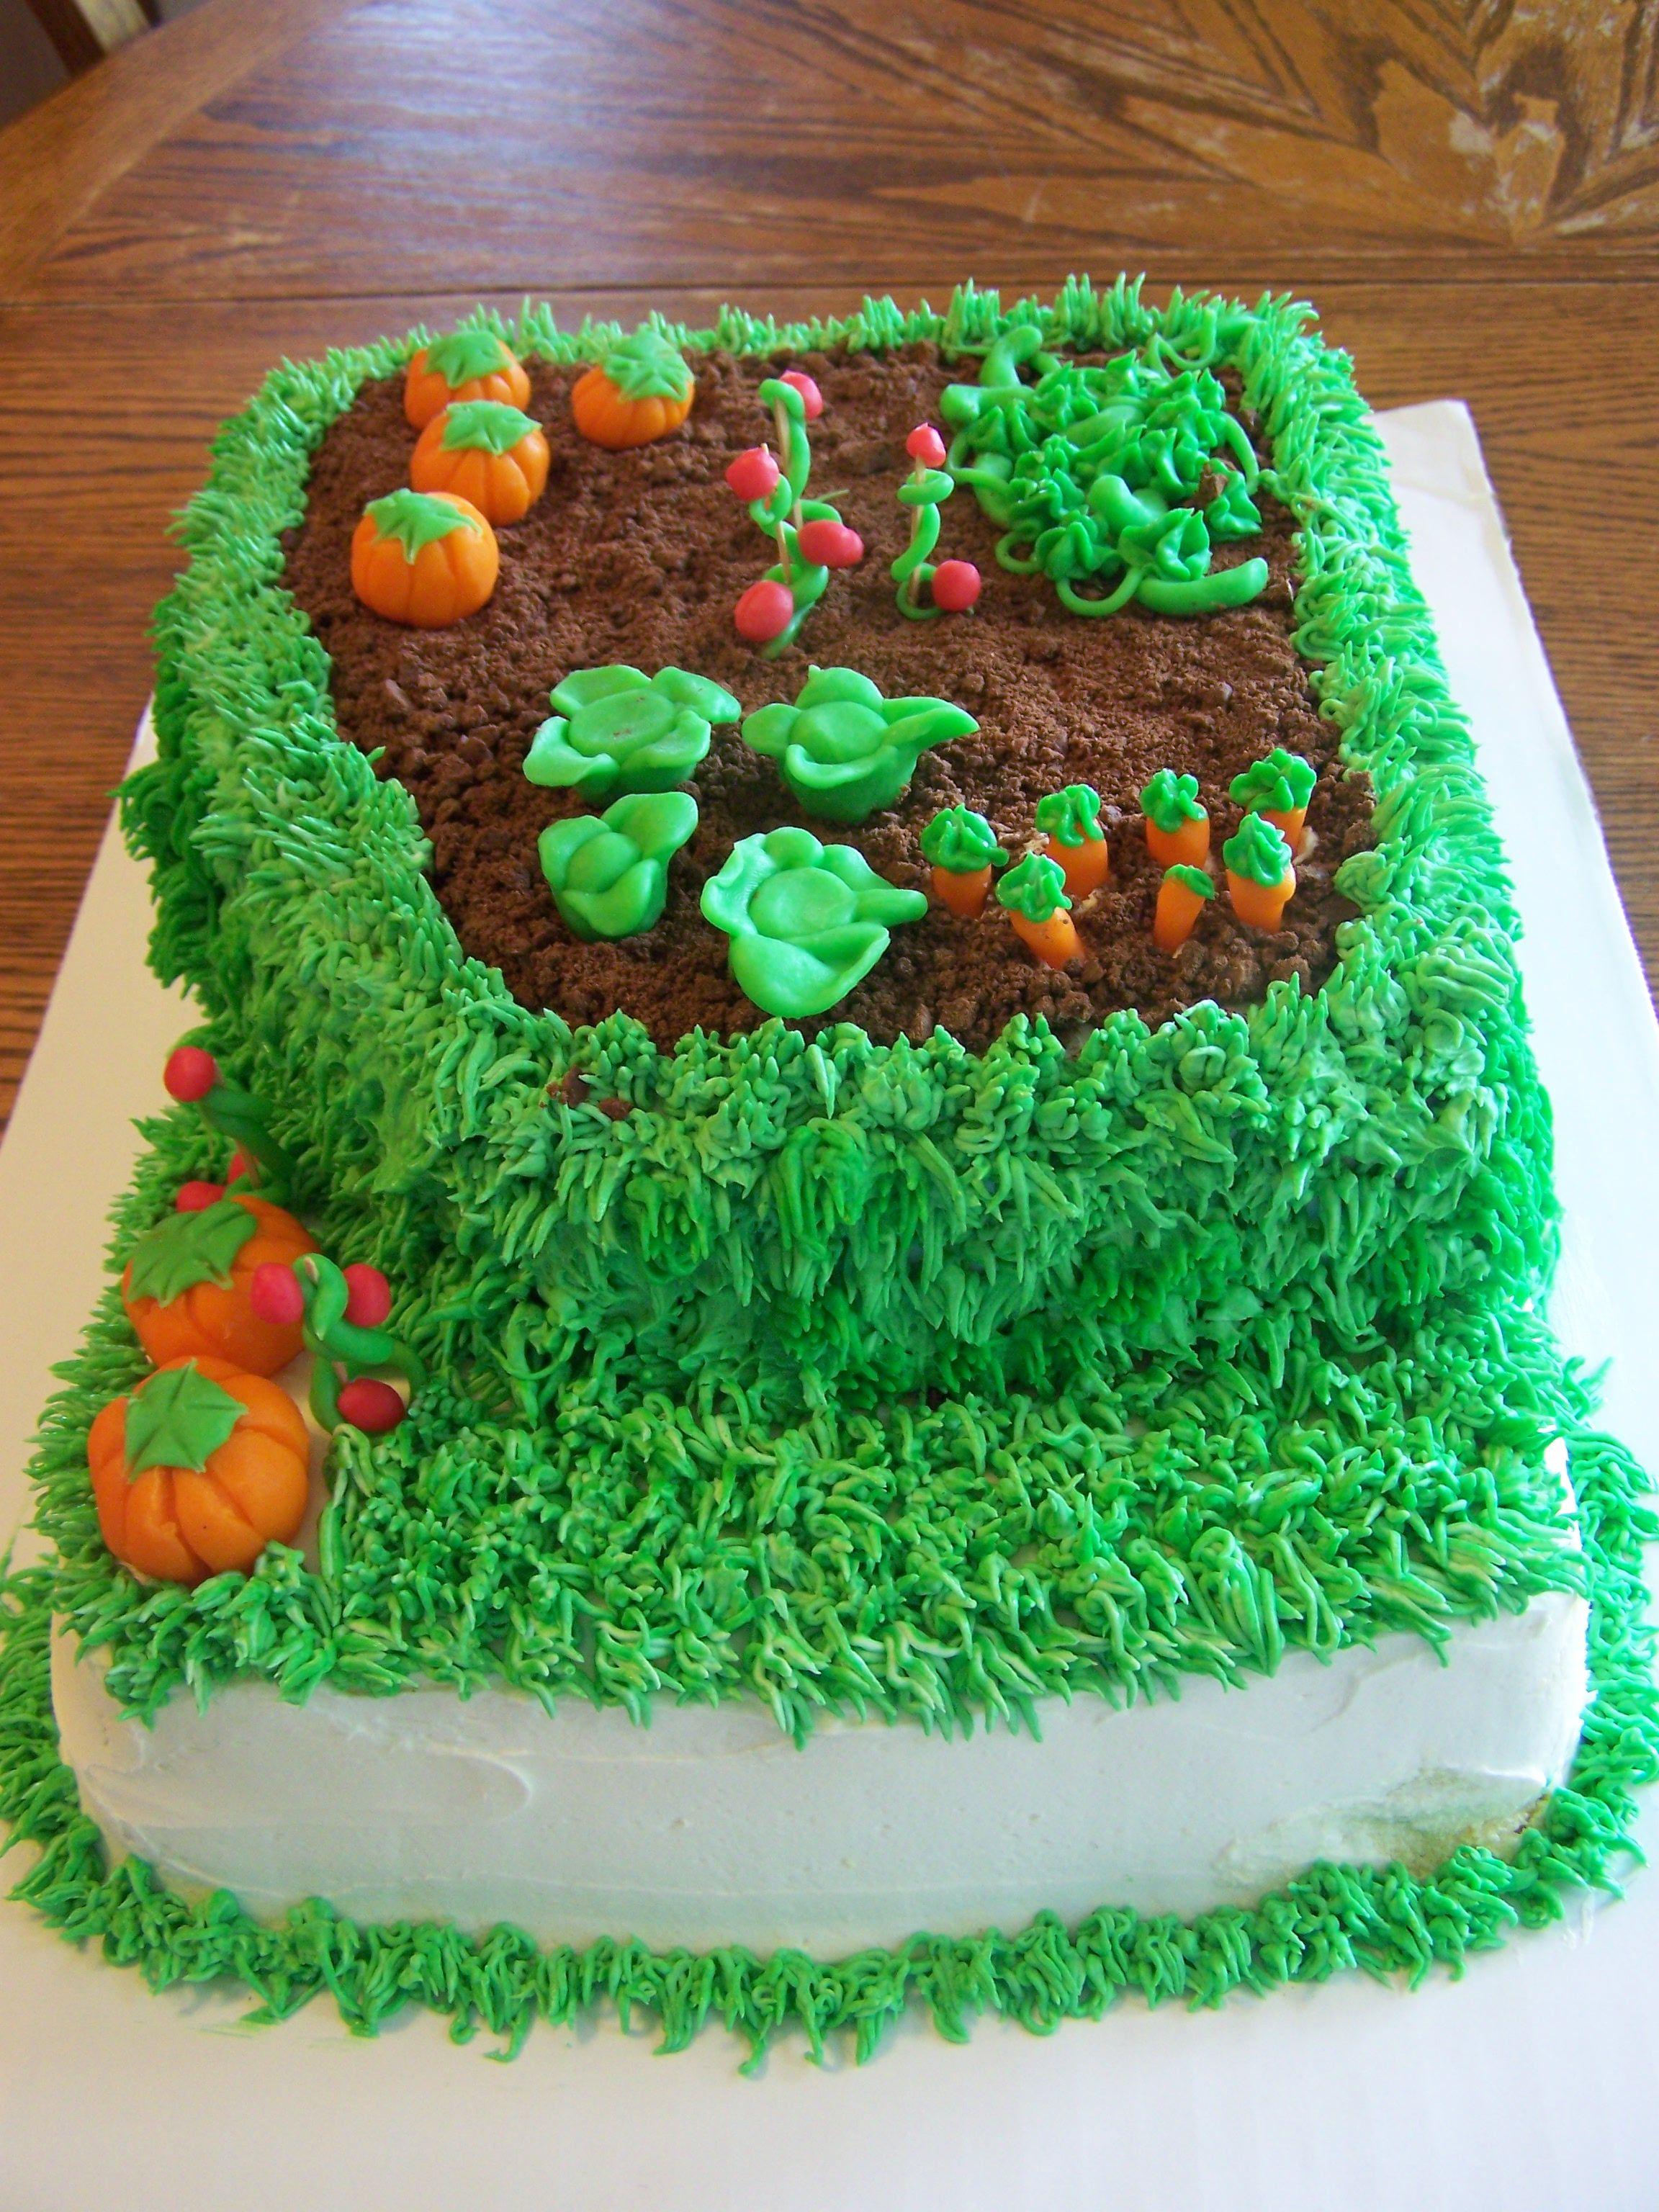 garden cake - how cute!